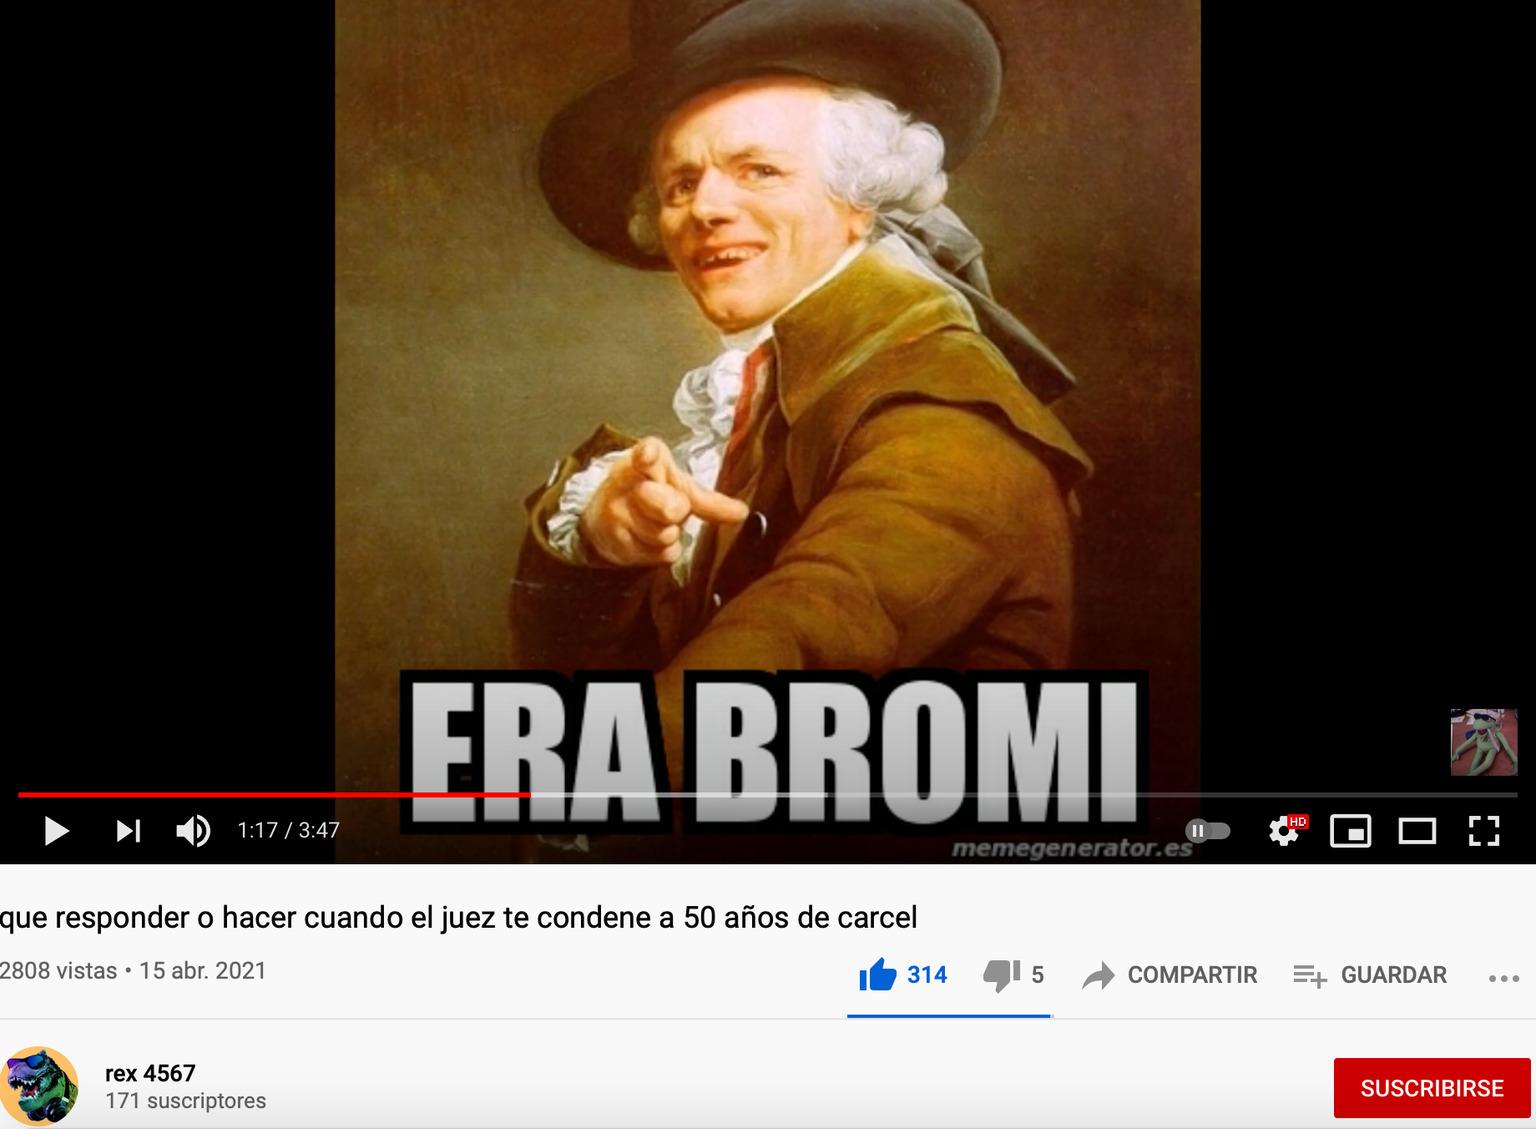 ERA BROMA - meme